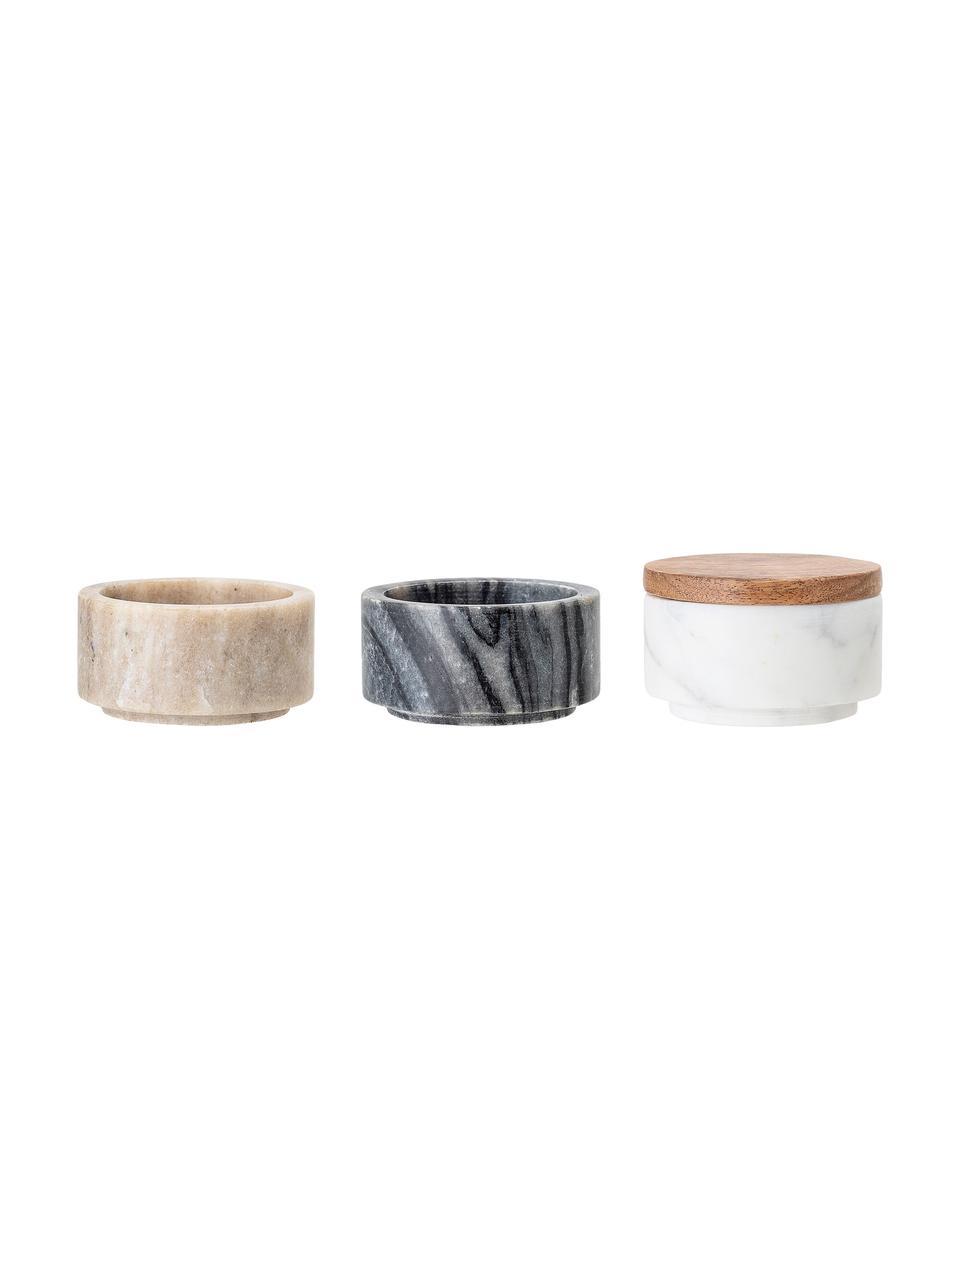 Opbergpottenset Gatherings van marmer, 4-delig, Deksel: acaciahout, Bruin, grijs, wit, gemarmerd, Ø 8 x H 12 cm